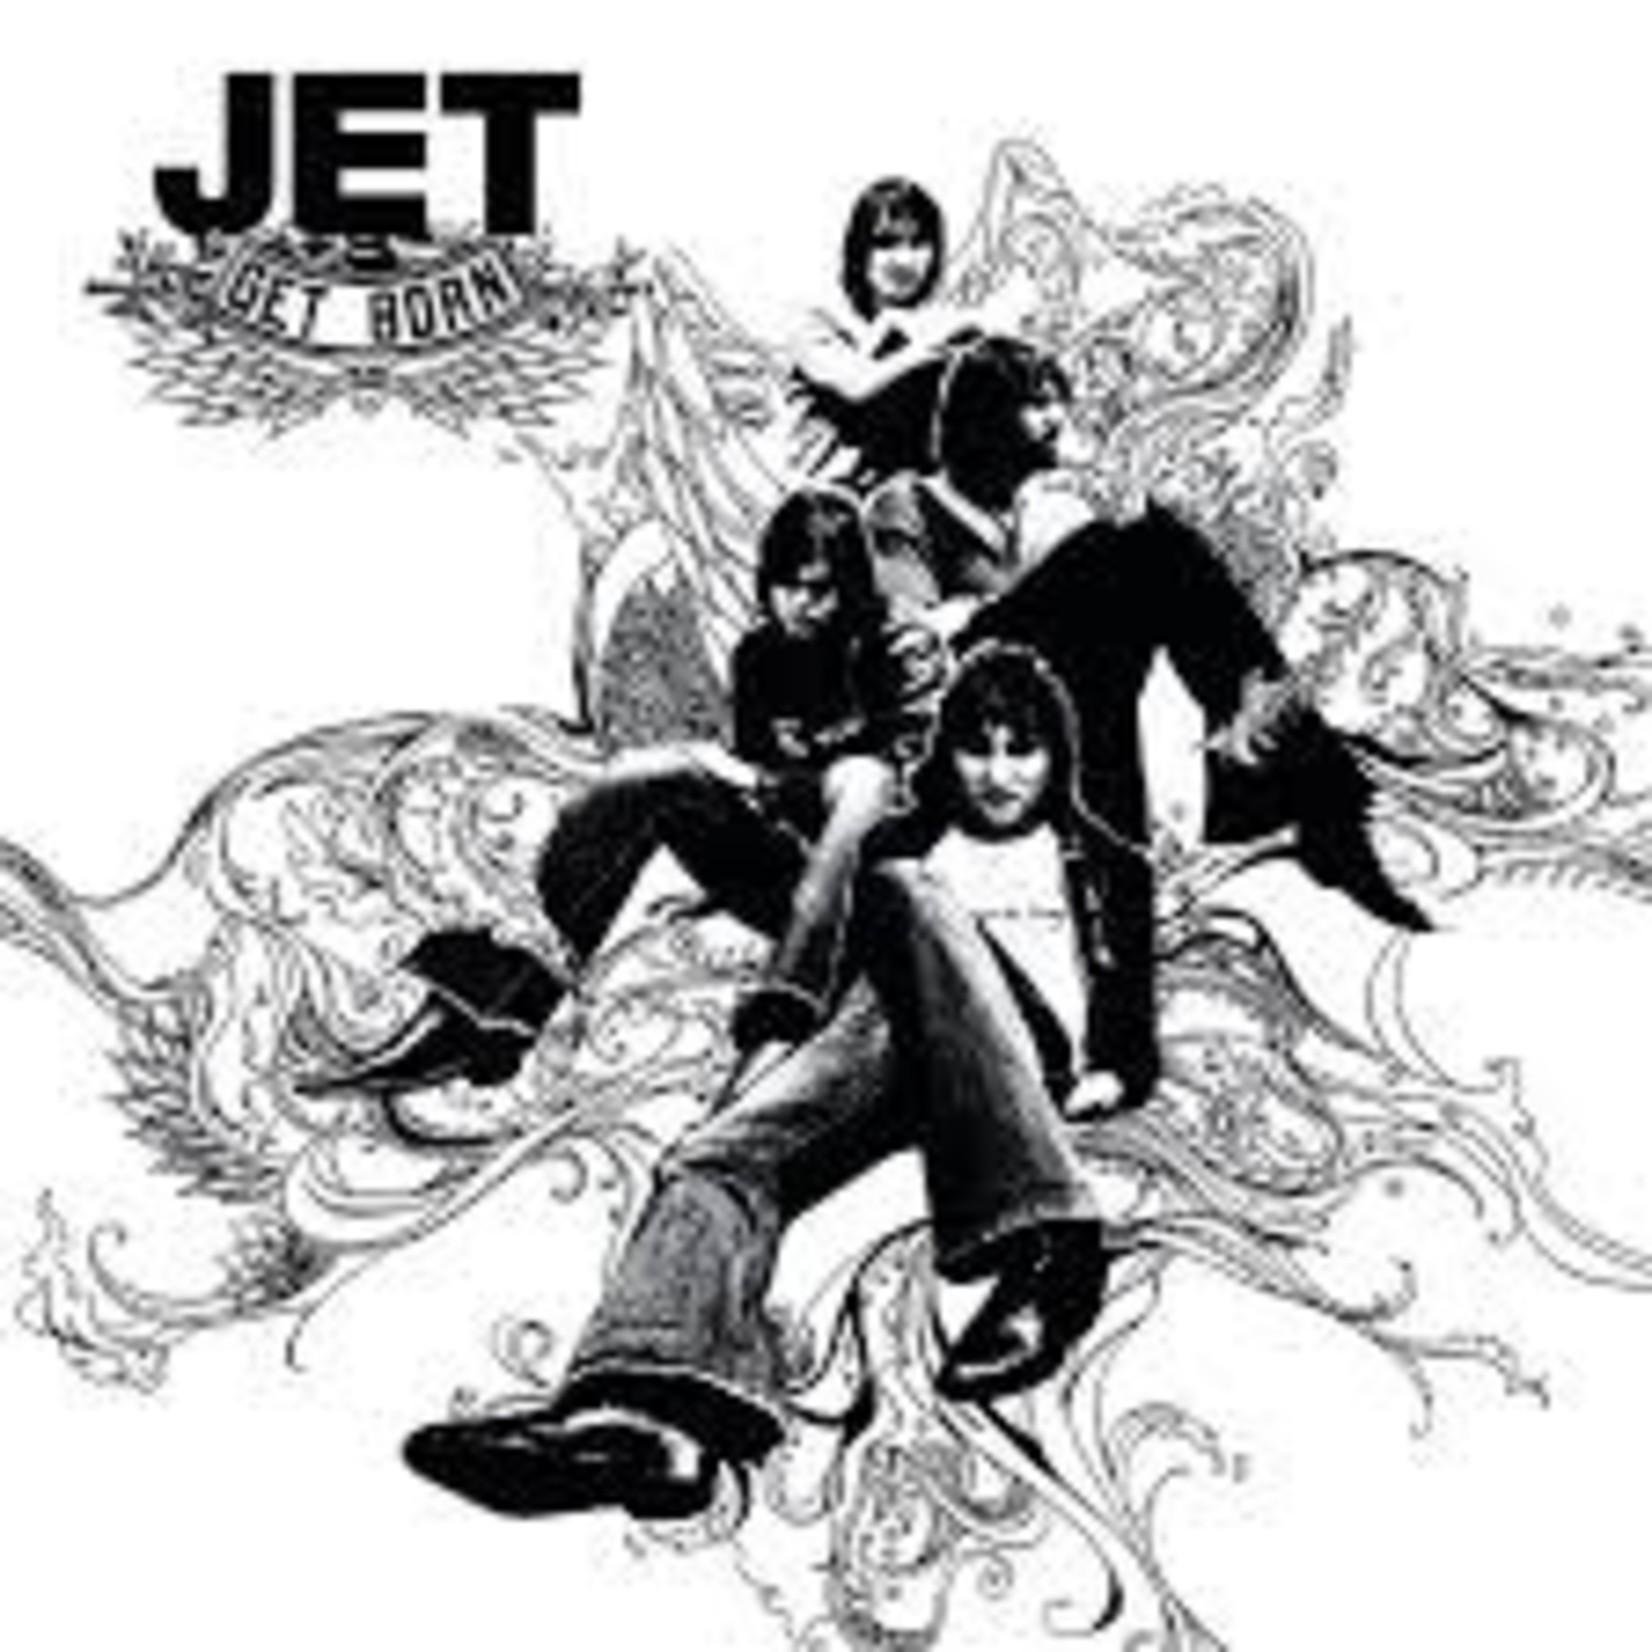 Vinyl Jet - Get Born